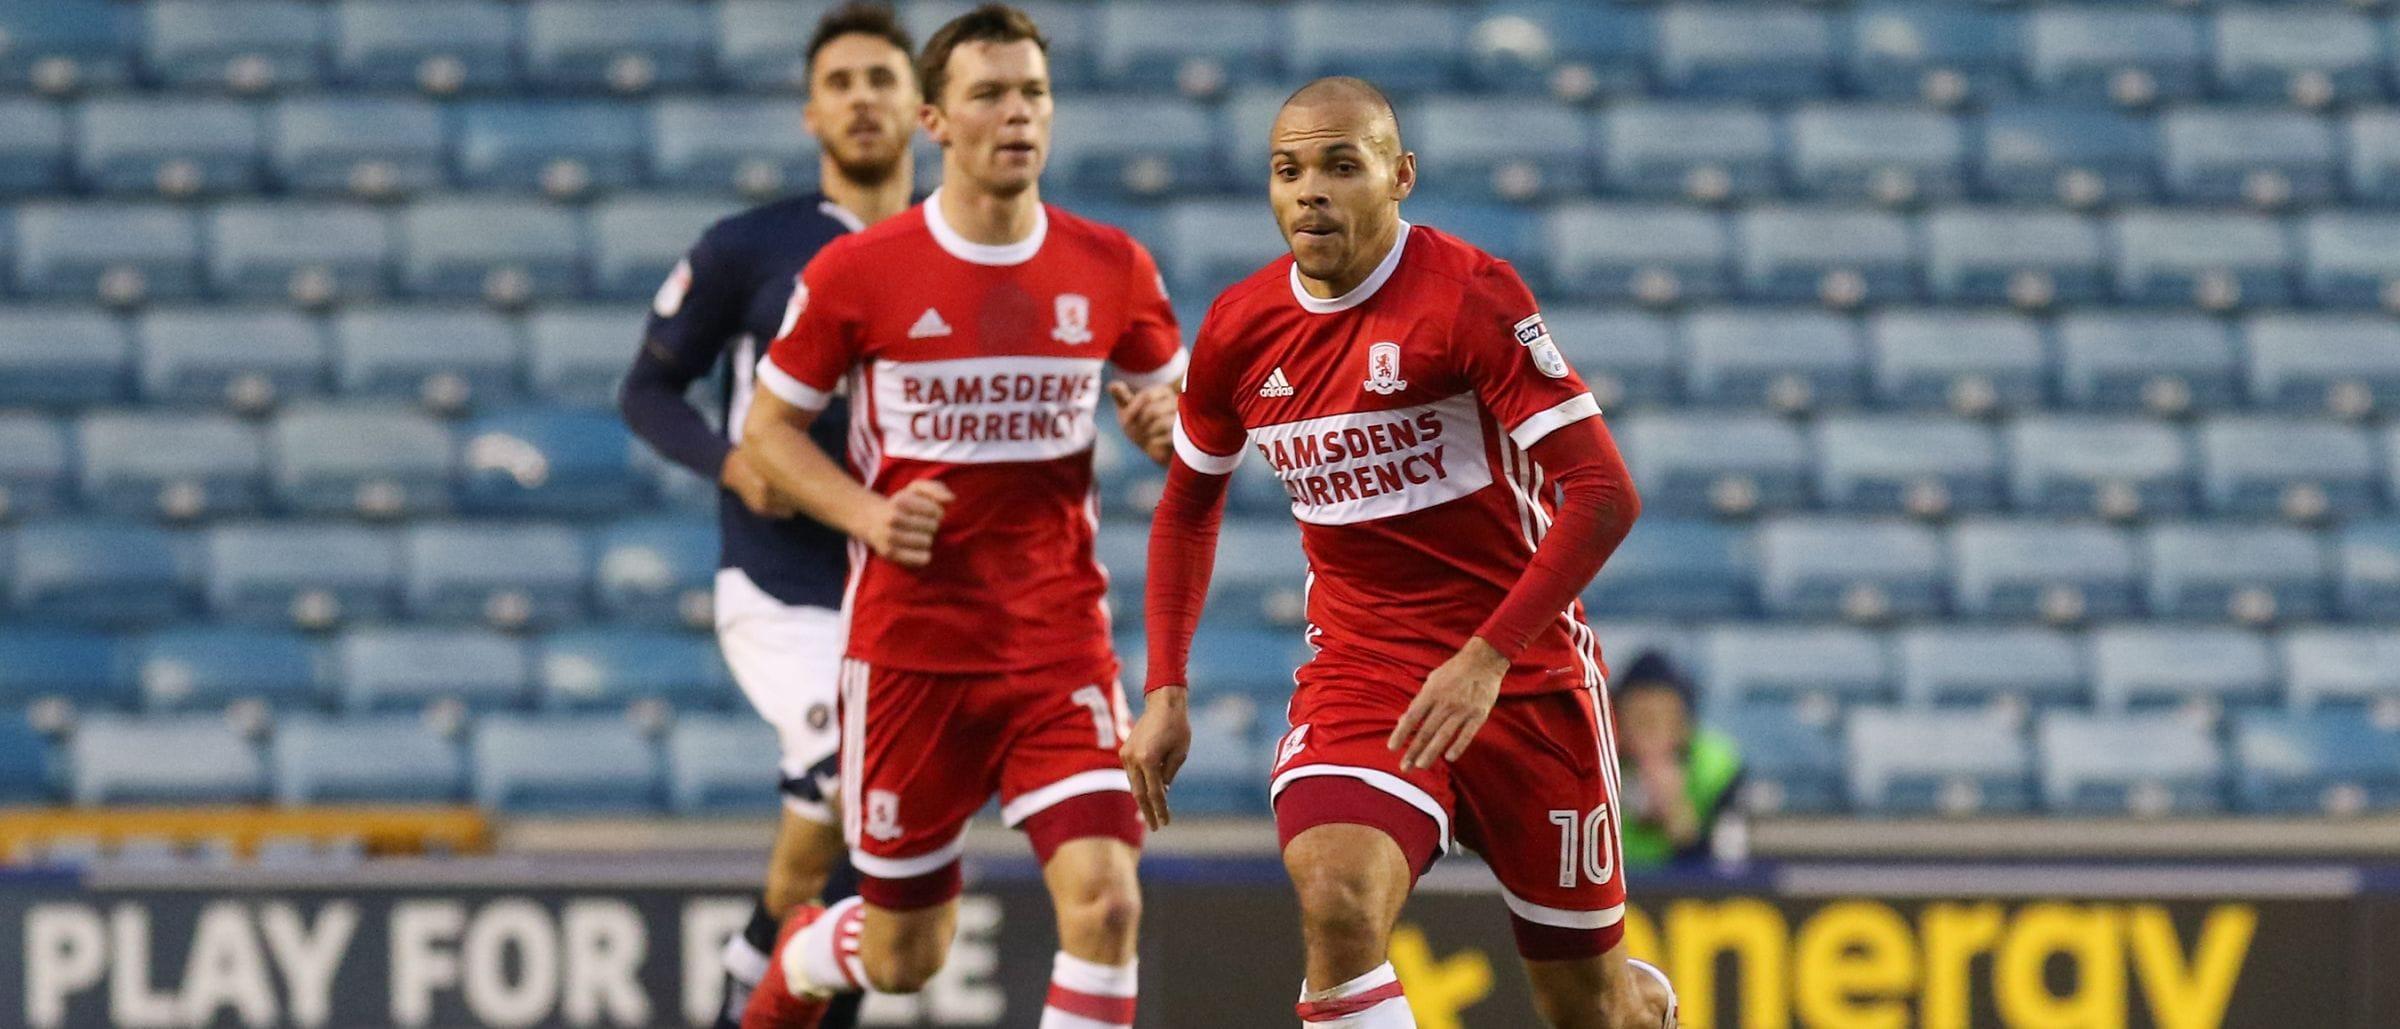 Middlesbrough vs sheffield wednesday betting tips ama madison sports betting